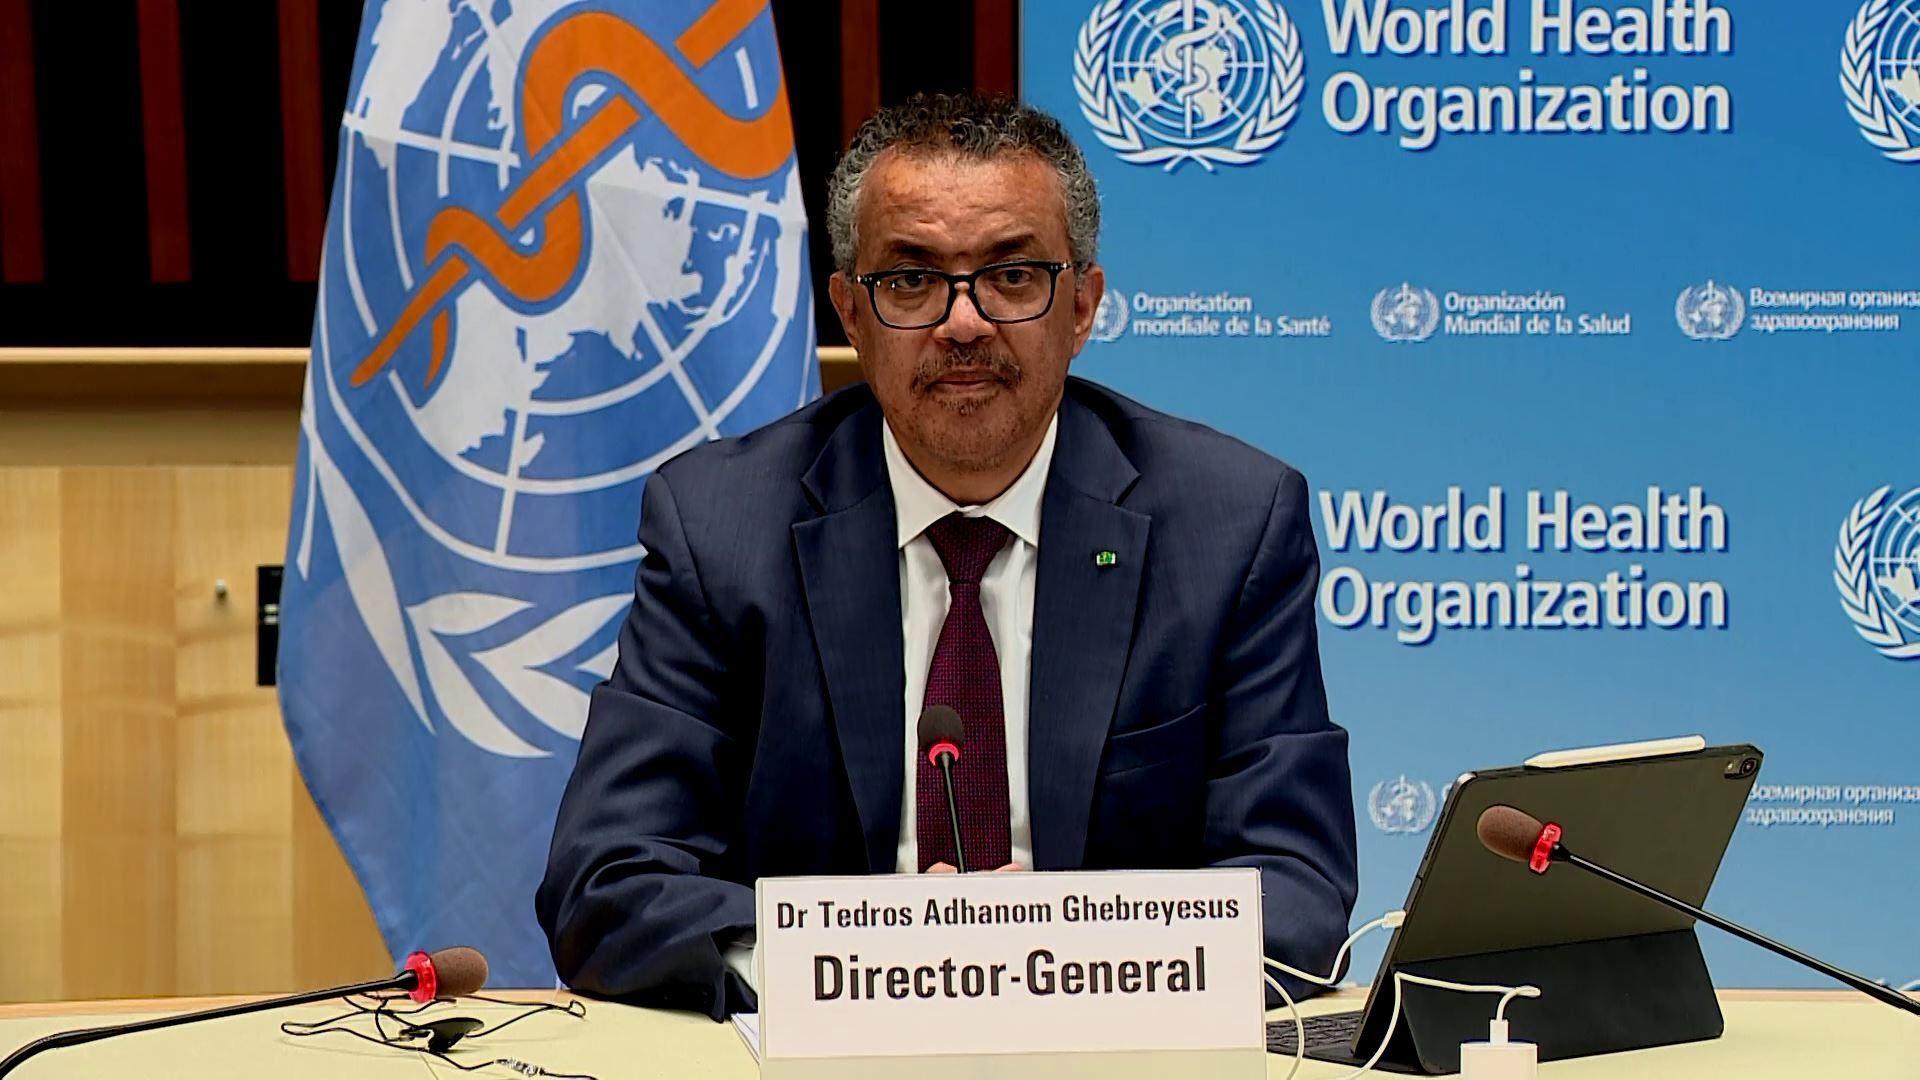 Tổng Giám đốc WHO Tedros Adhanom Ghebreyesus. Ảnh: thenewsmarket.